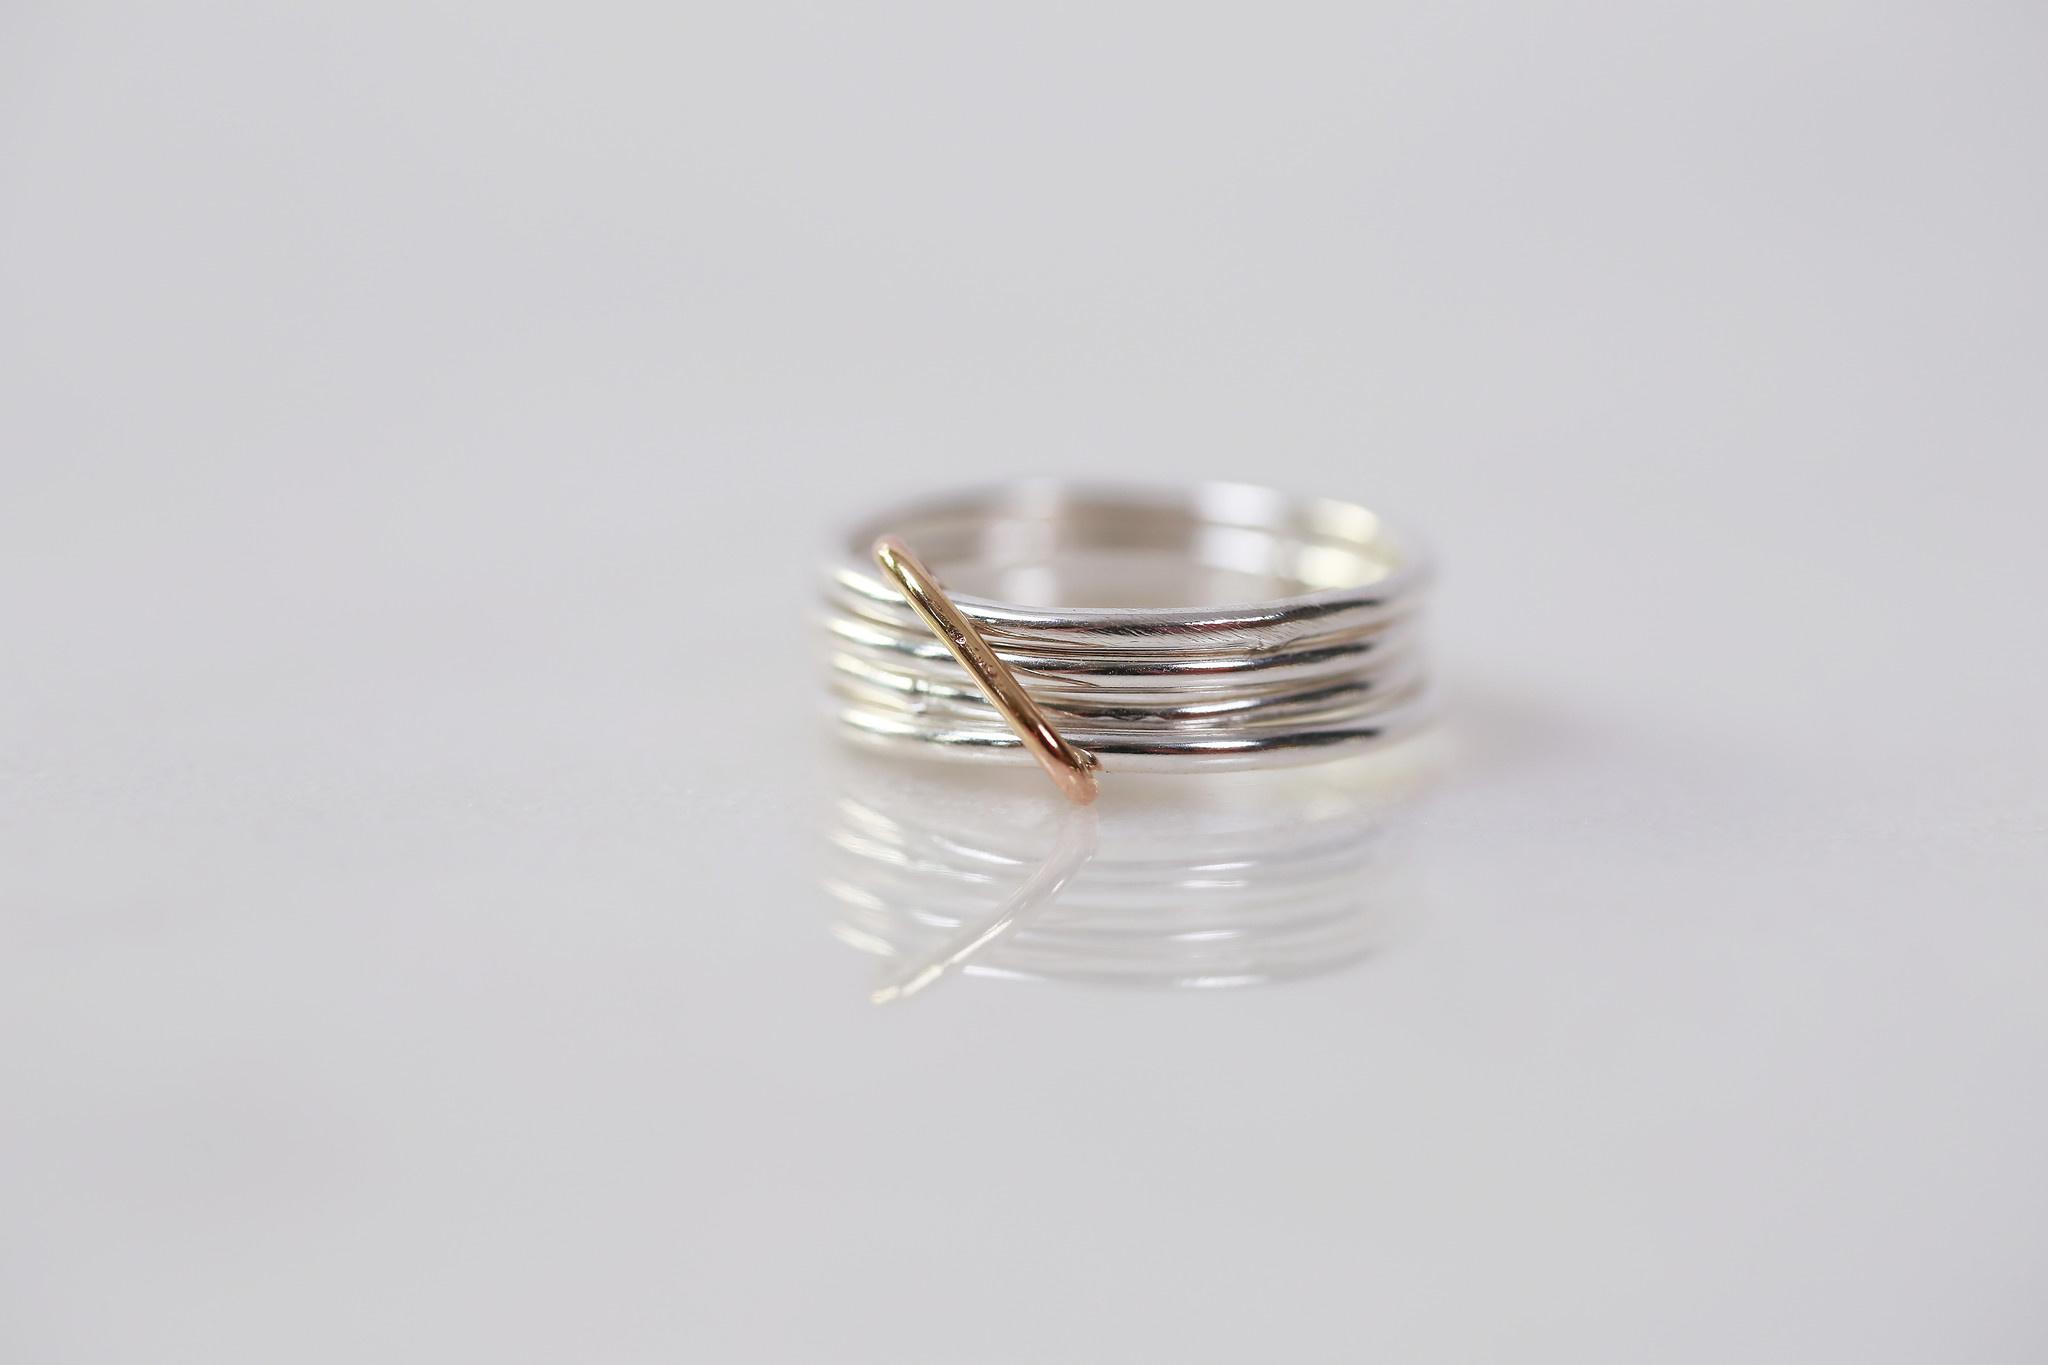 Chertova Fidget Ring, Sterling Silver and 14k Gold Filled